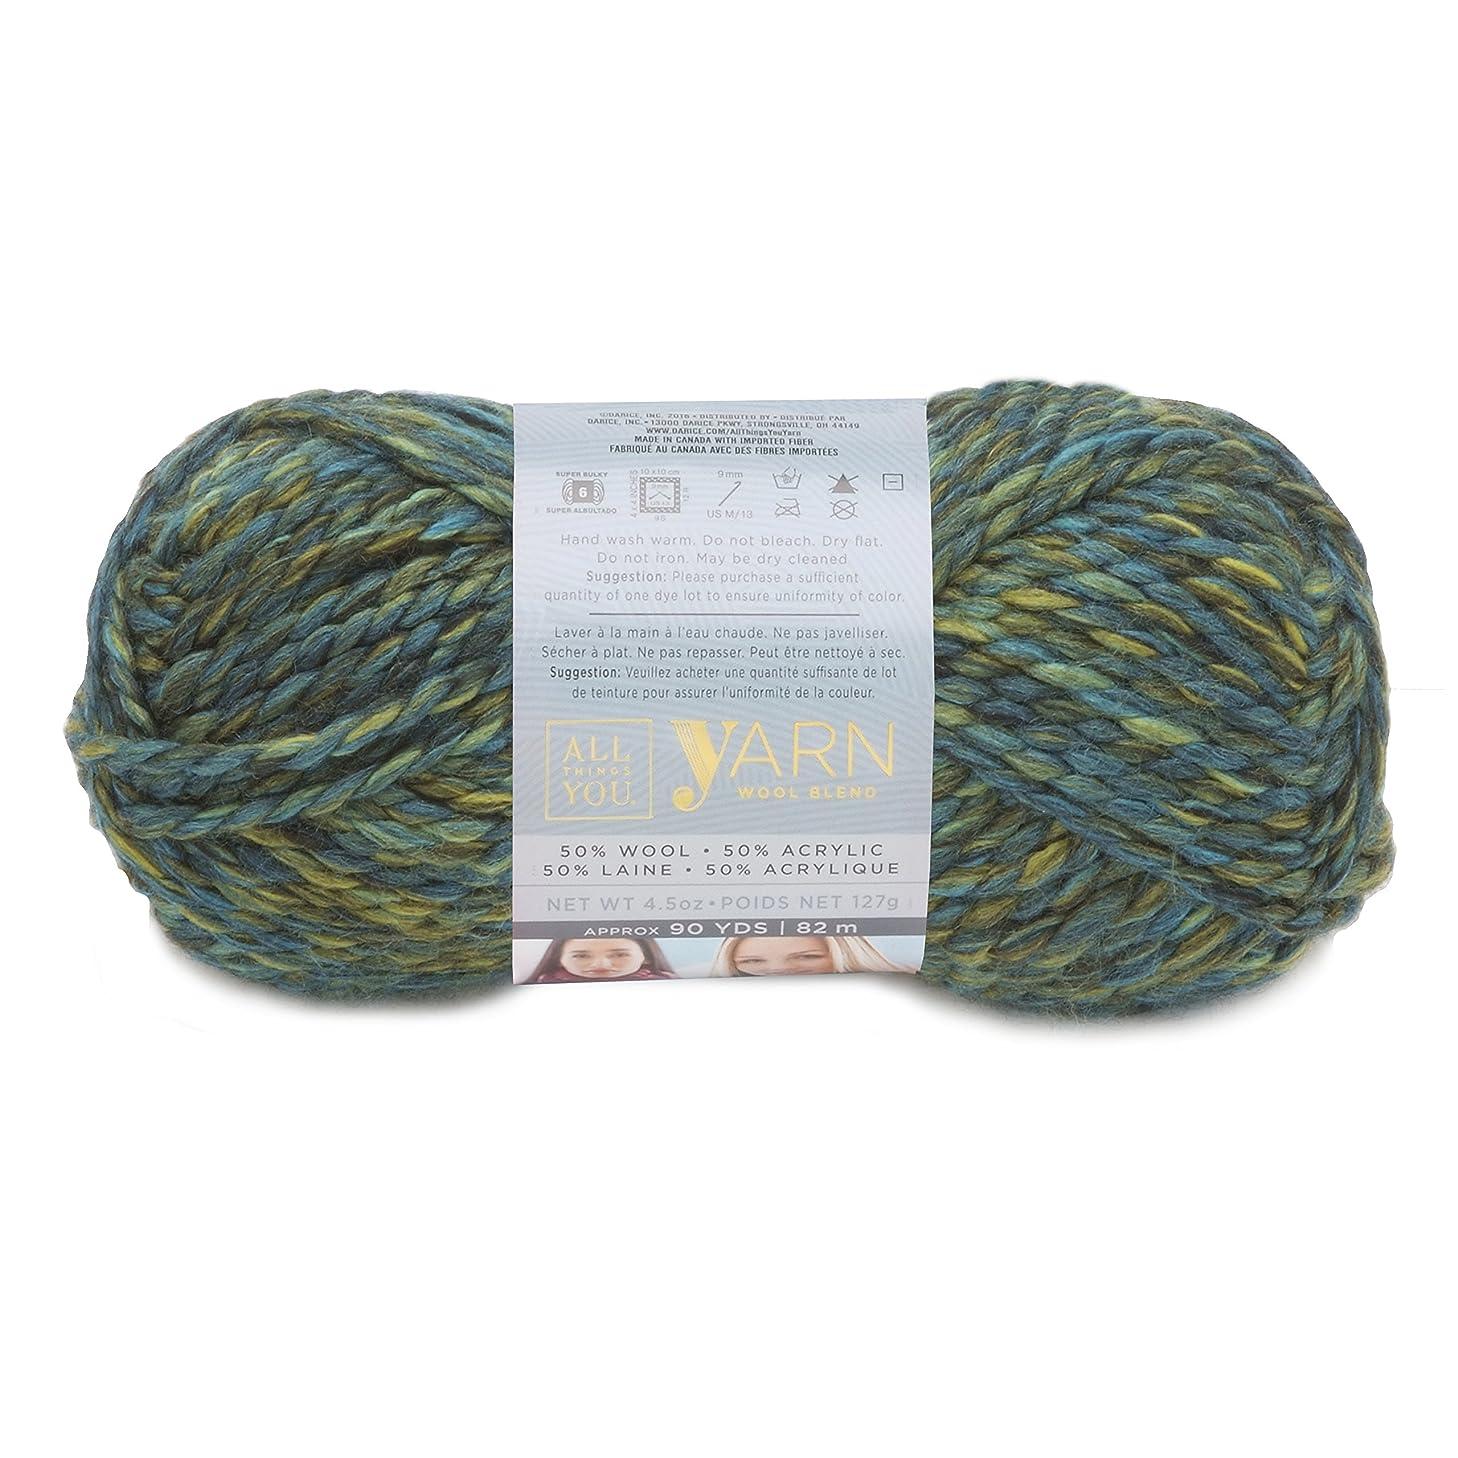 Darice All Things You, Wool and Acylic Blend Yarn, Earth Tones